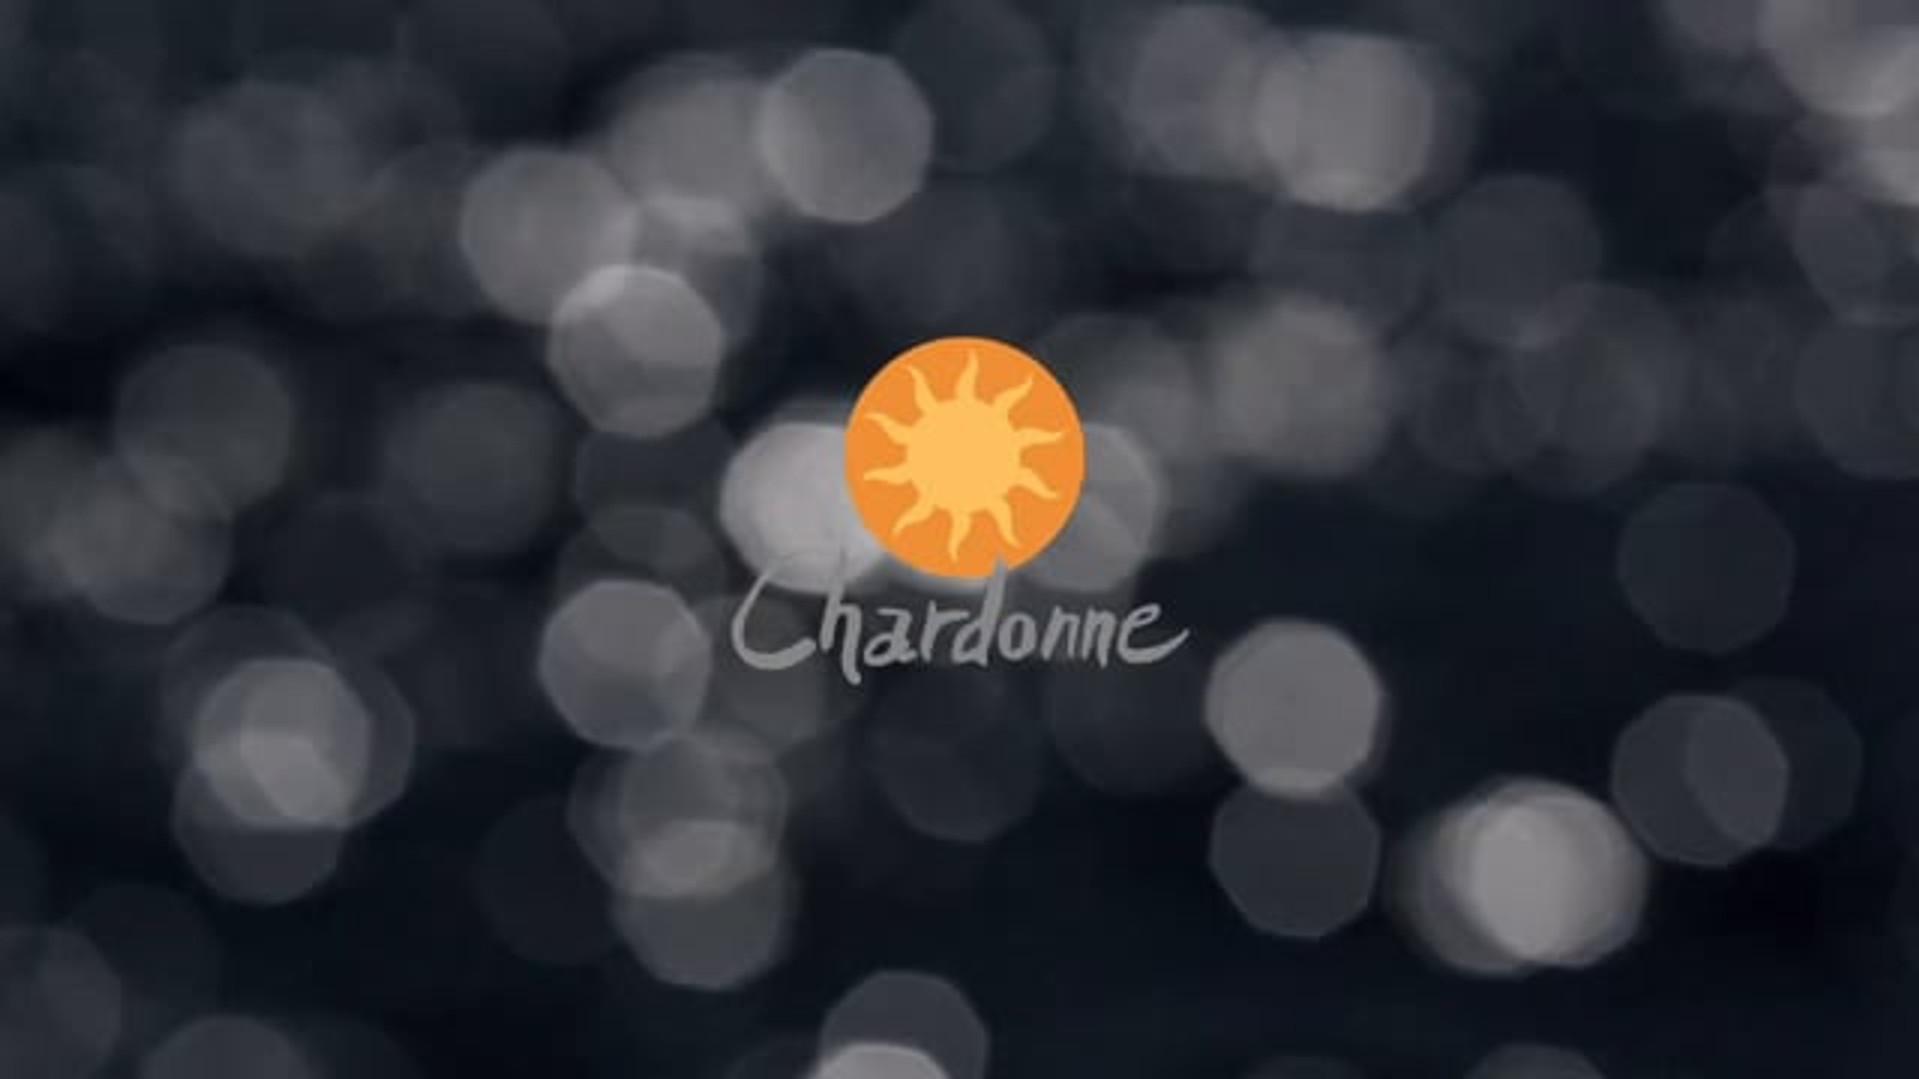 Appellation Chardonne